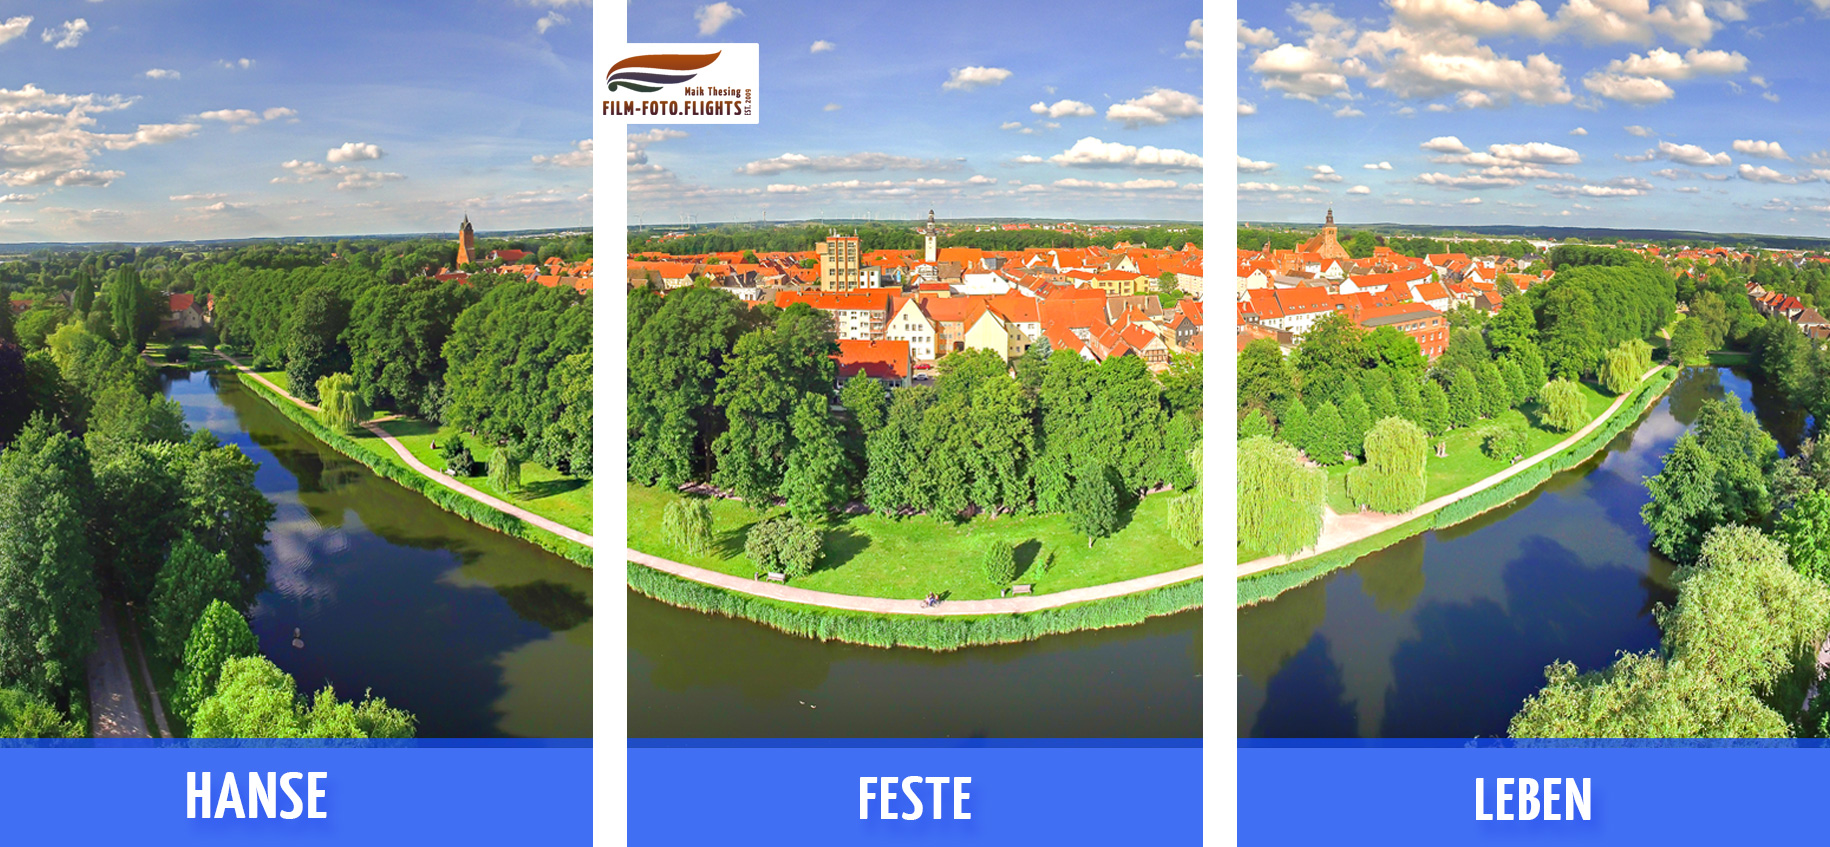 gardelegen-poster-plakat-wall-hansestadt-luftbild-luftaufnahme-fotograf-3-tuerme-hopfentuerme-rathaus-marienkirche-nikolaikirche-hansefest-stadtgraben-panorama-hansefest